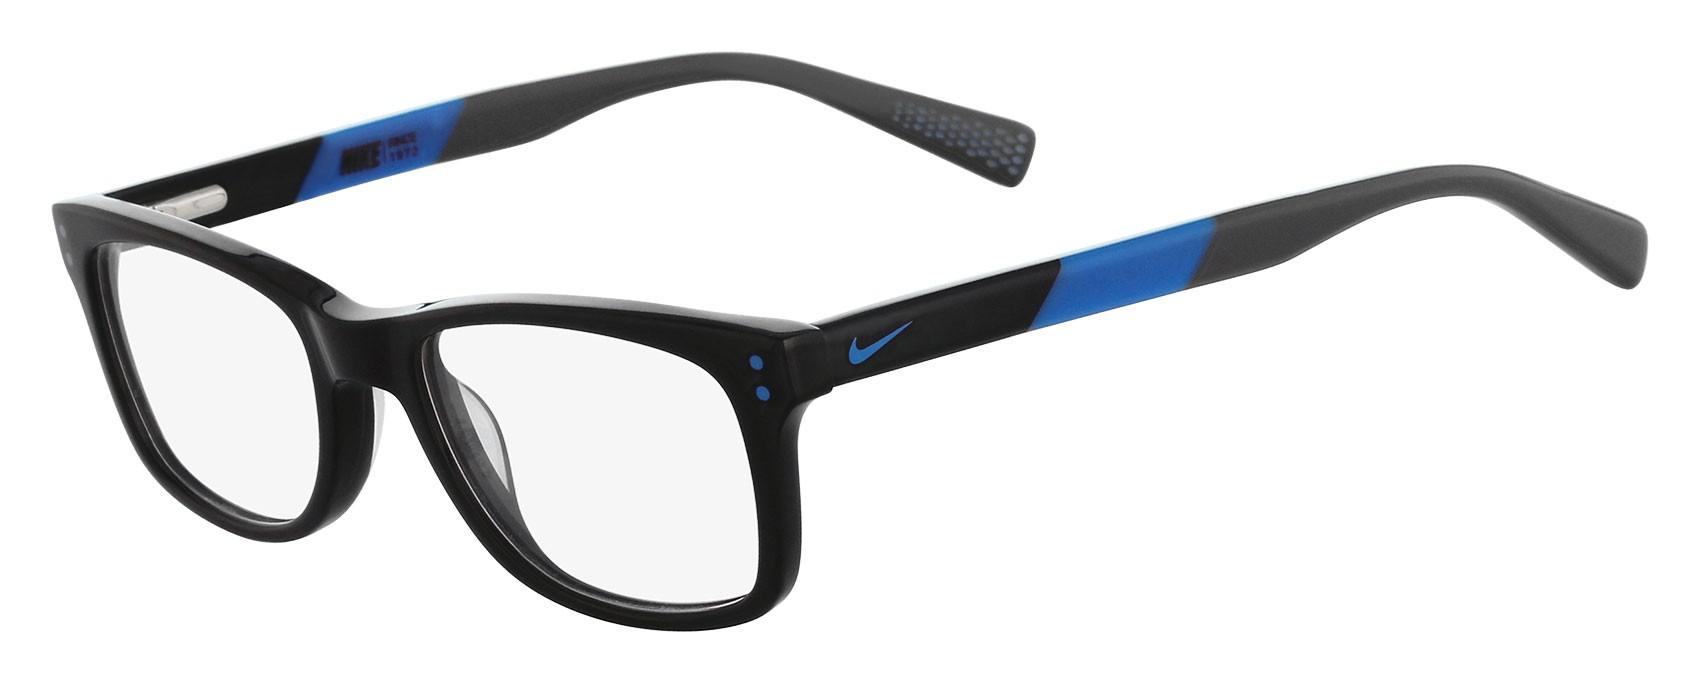 859b89c392ad6 Nike 5538 013 - Óculos de Grau